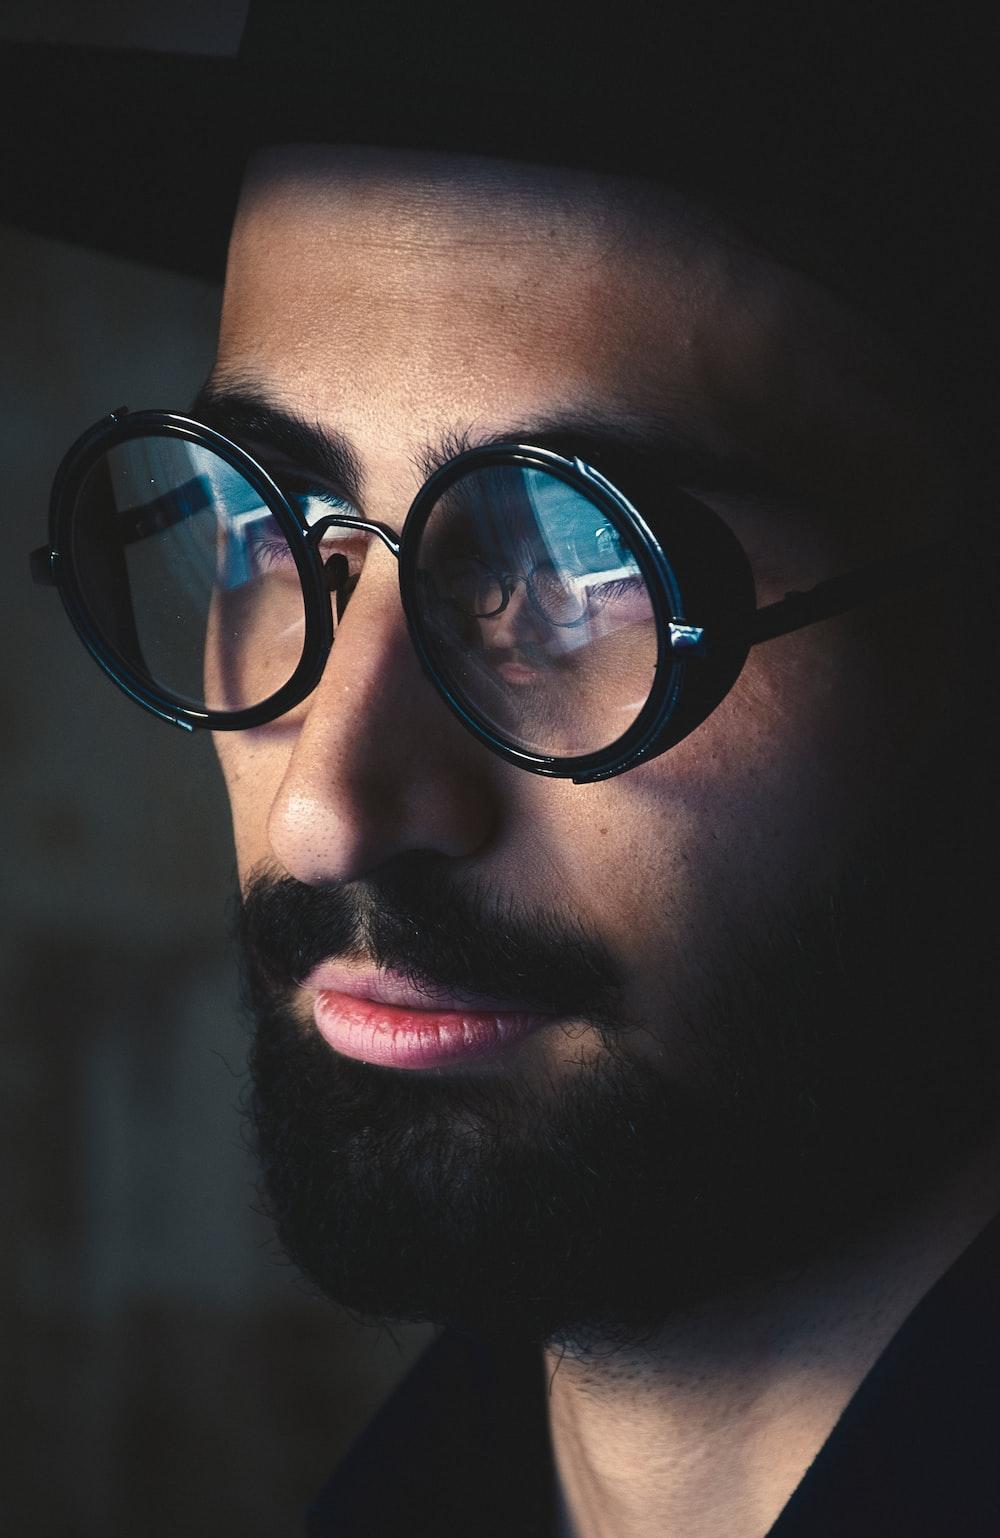 selective focus photography of man wearing black framed eyeglasses